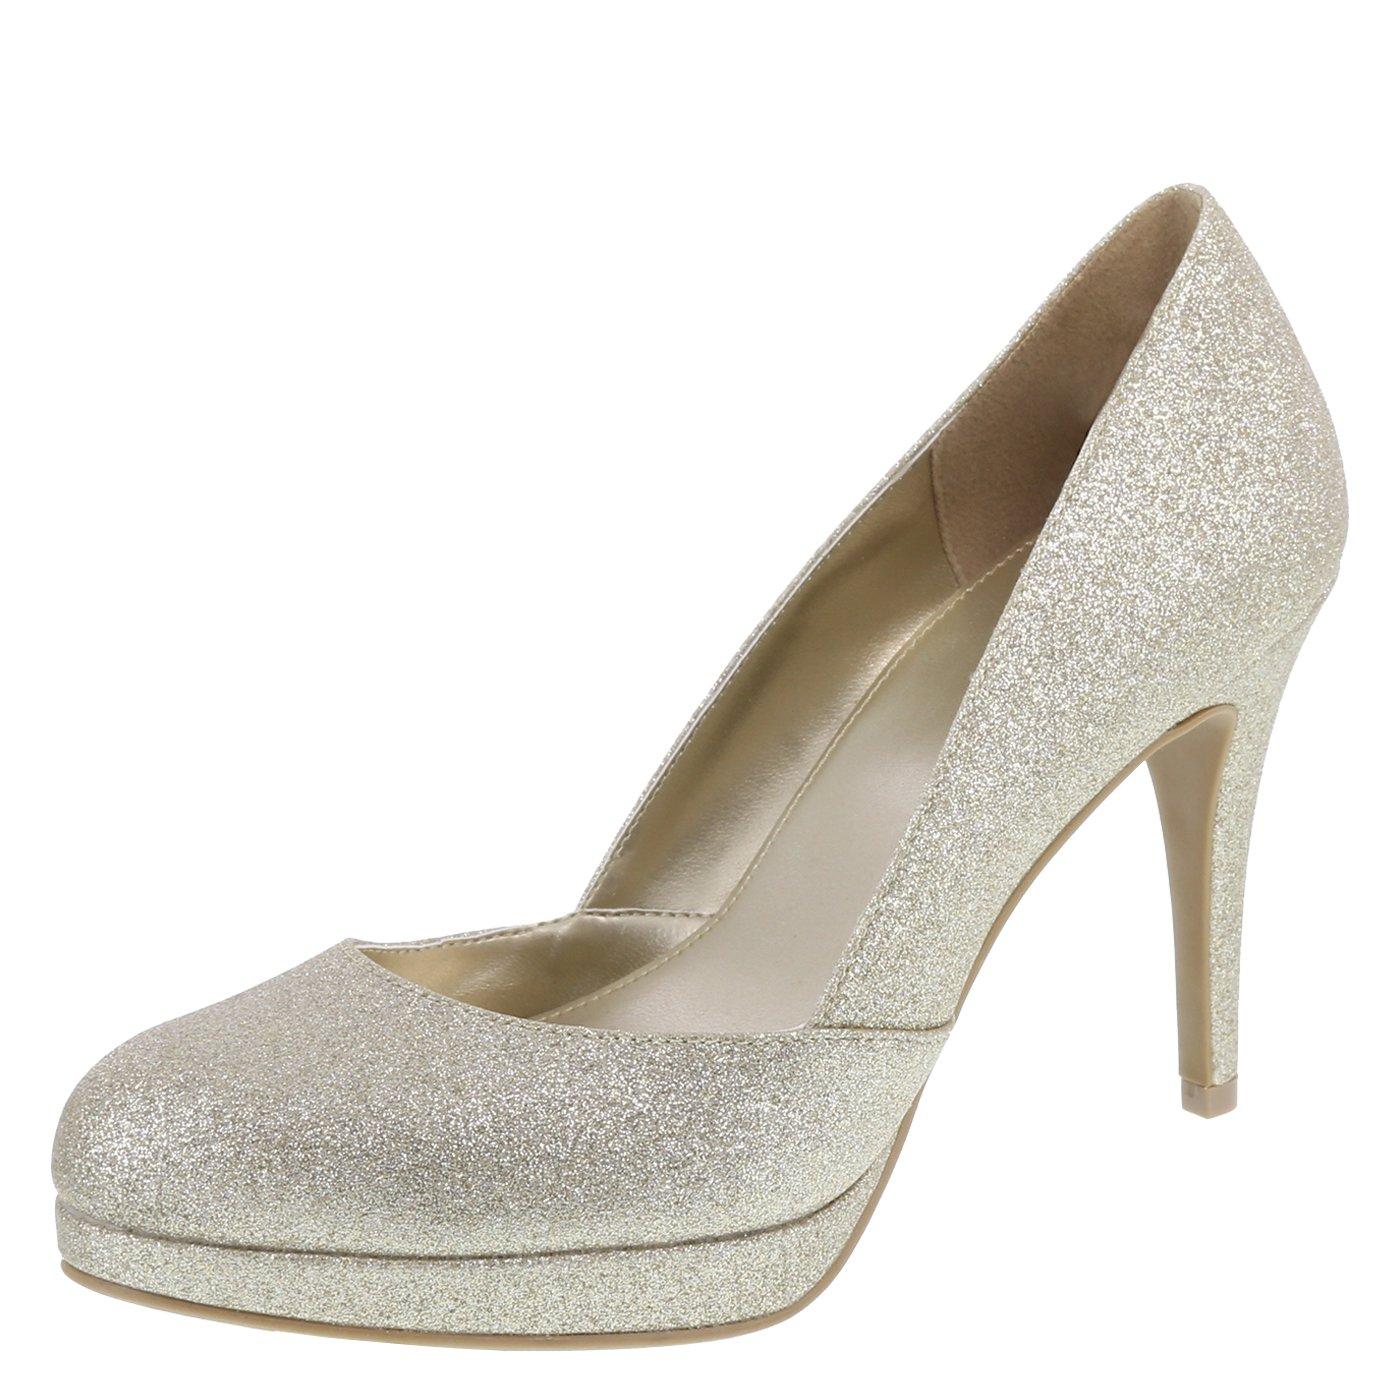 Fioni Gold Women's Jive Platform Heel 7.5 Regular